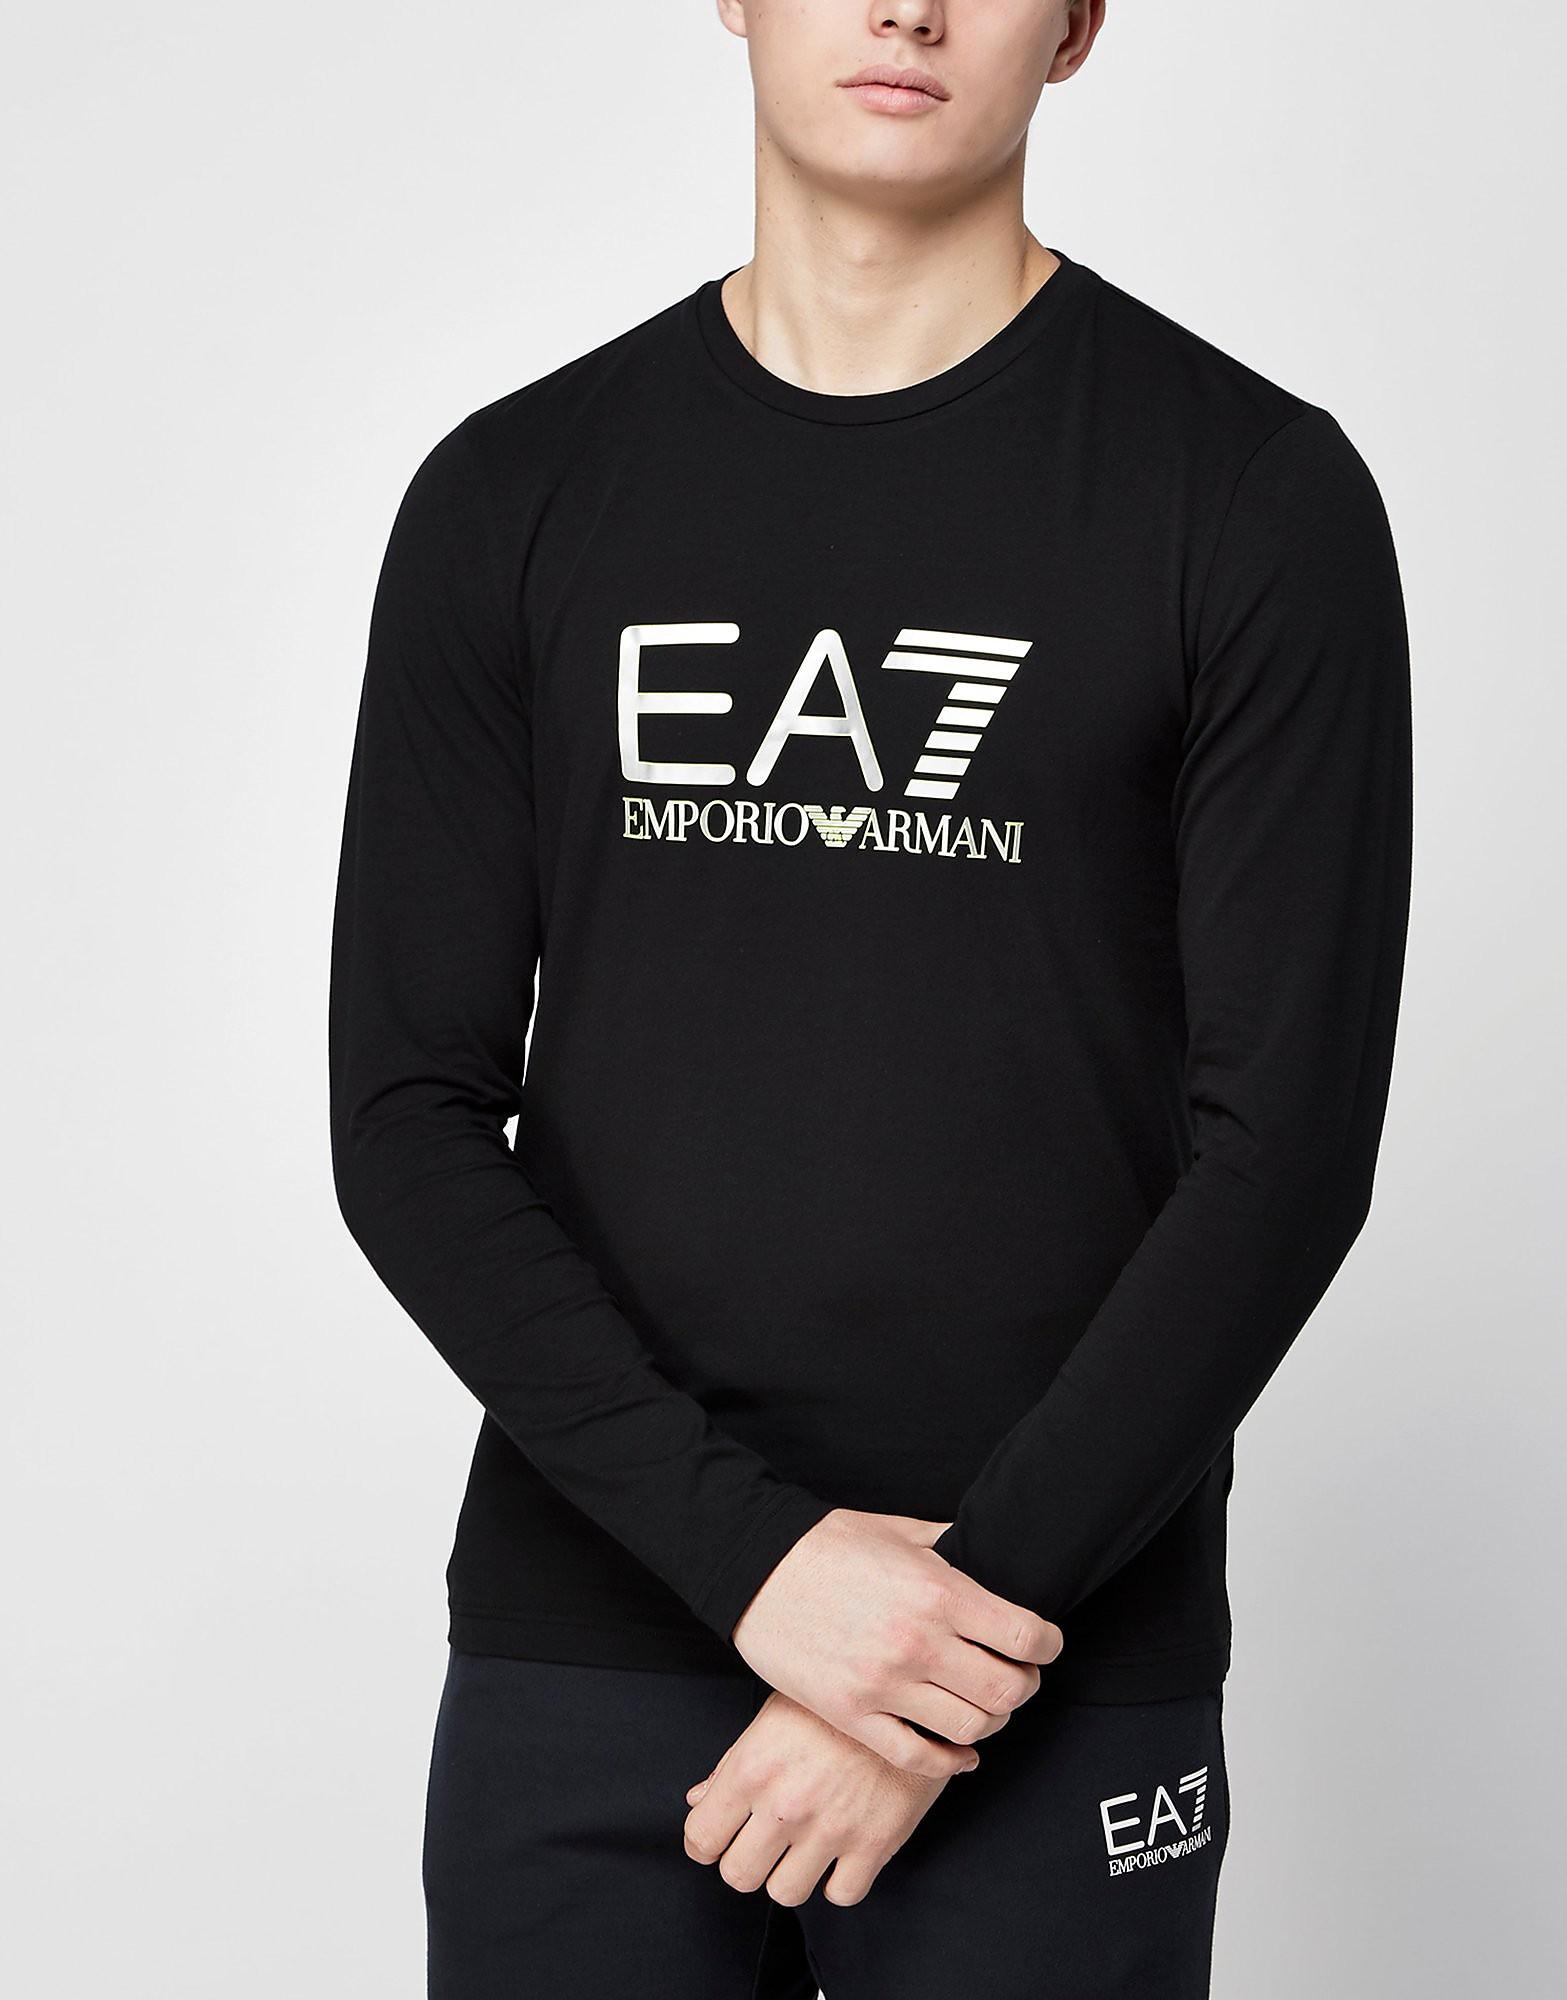 Emporio Armani EA7 Vis Logo Long Sleeve TShirt  Black Black